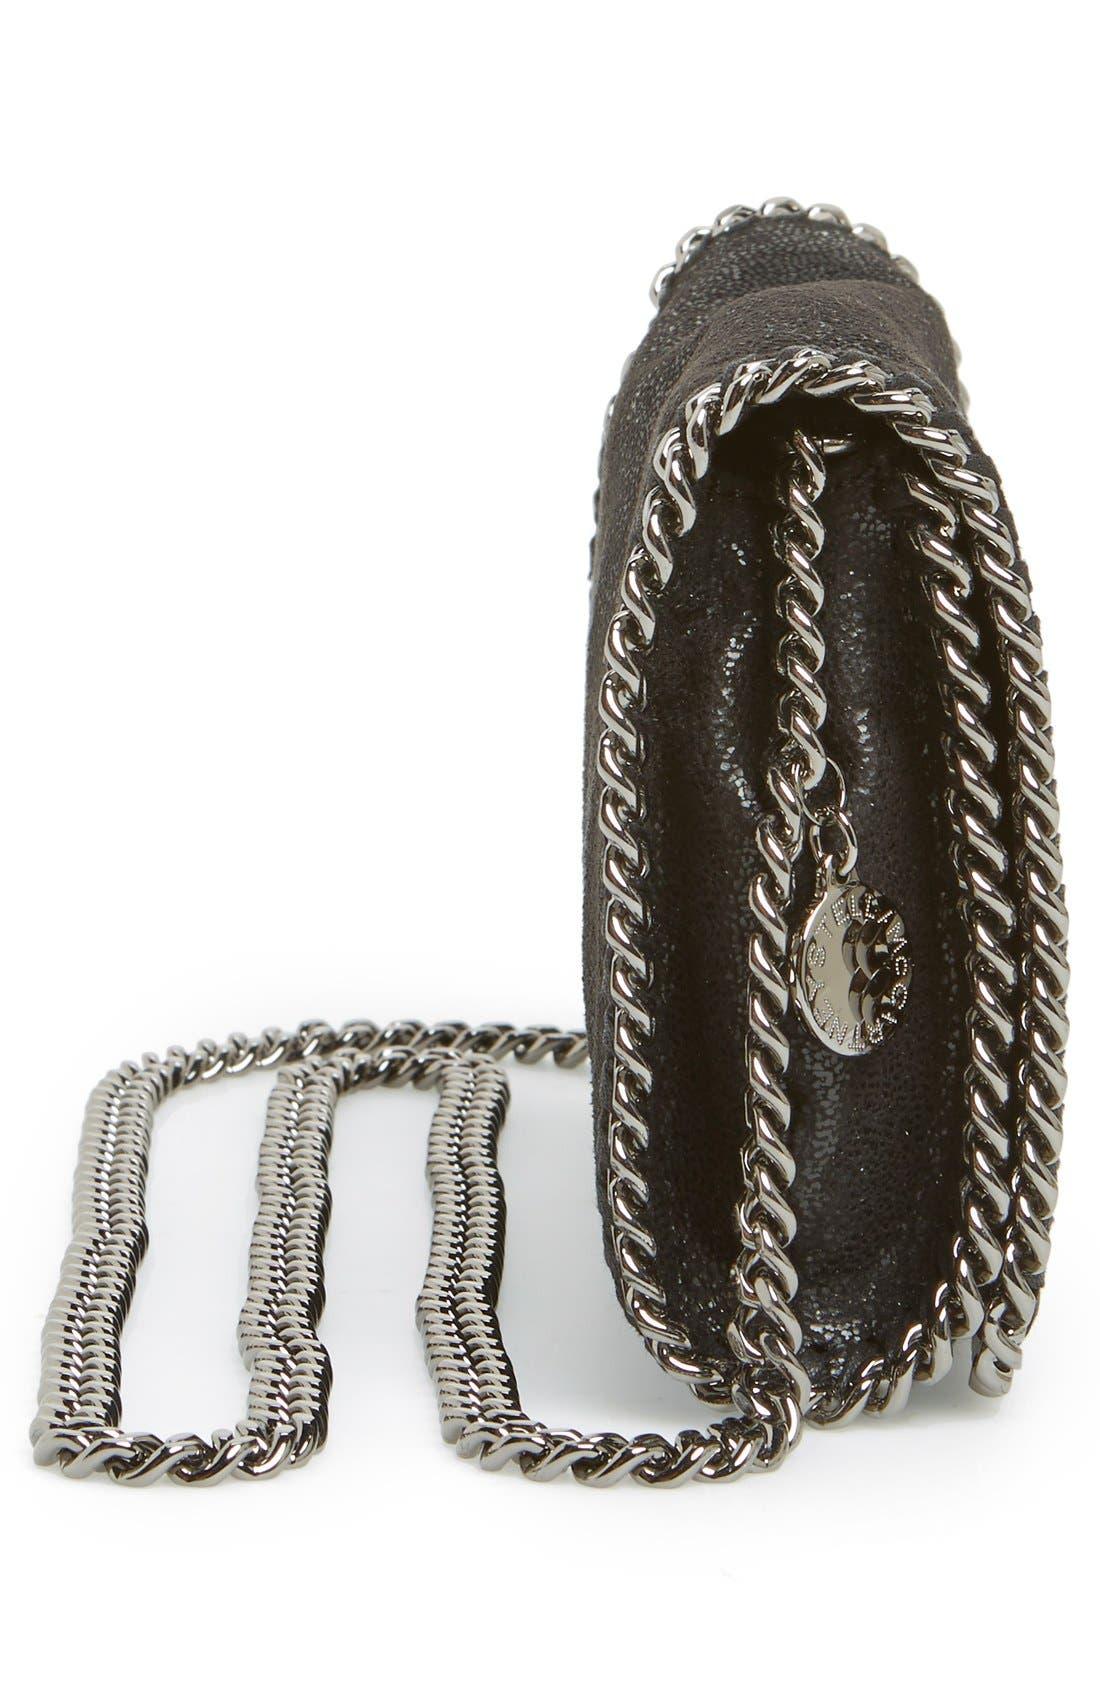 'Falabella - Shaggy Deer' Faux Leather Crossbody Bag,                             Alternate thumbnail 5, color,                             Black Slvr Hrdwr